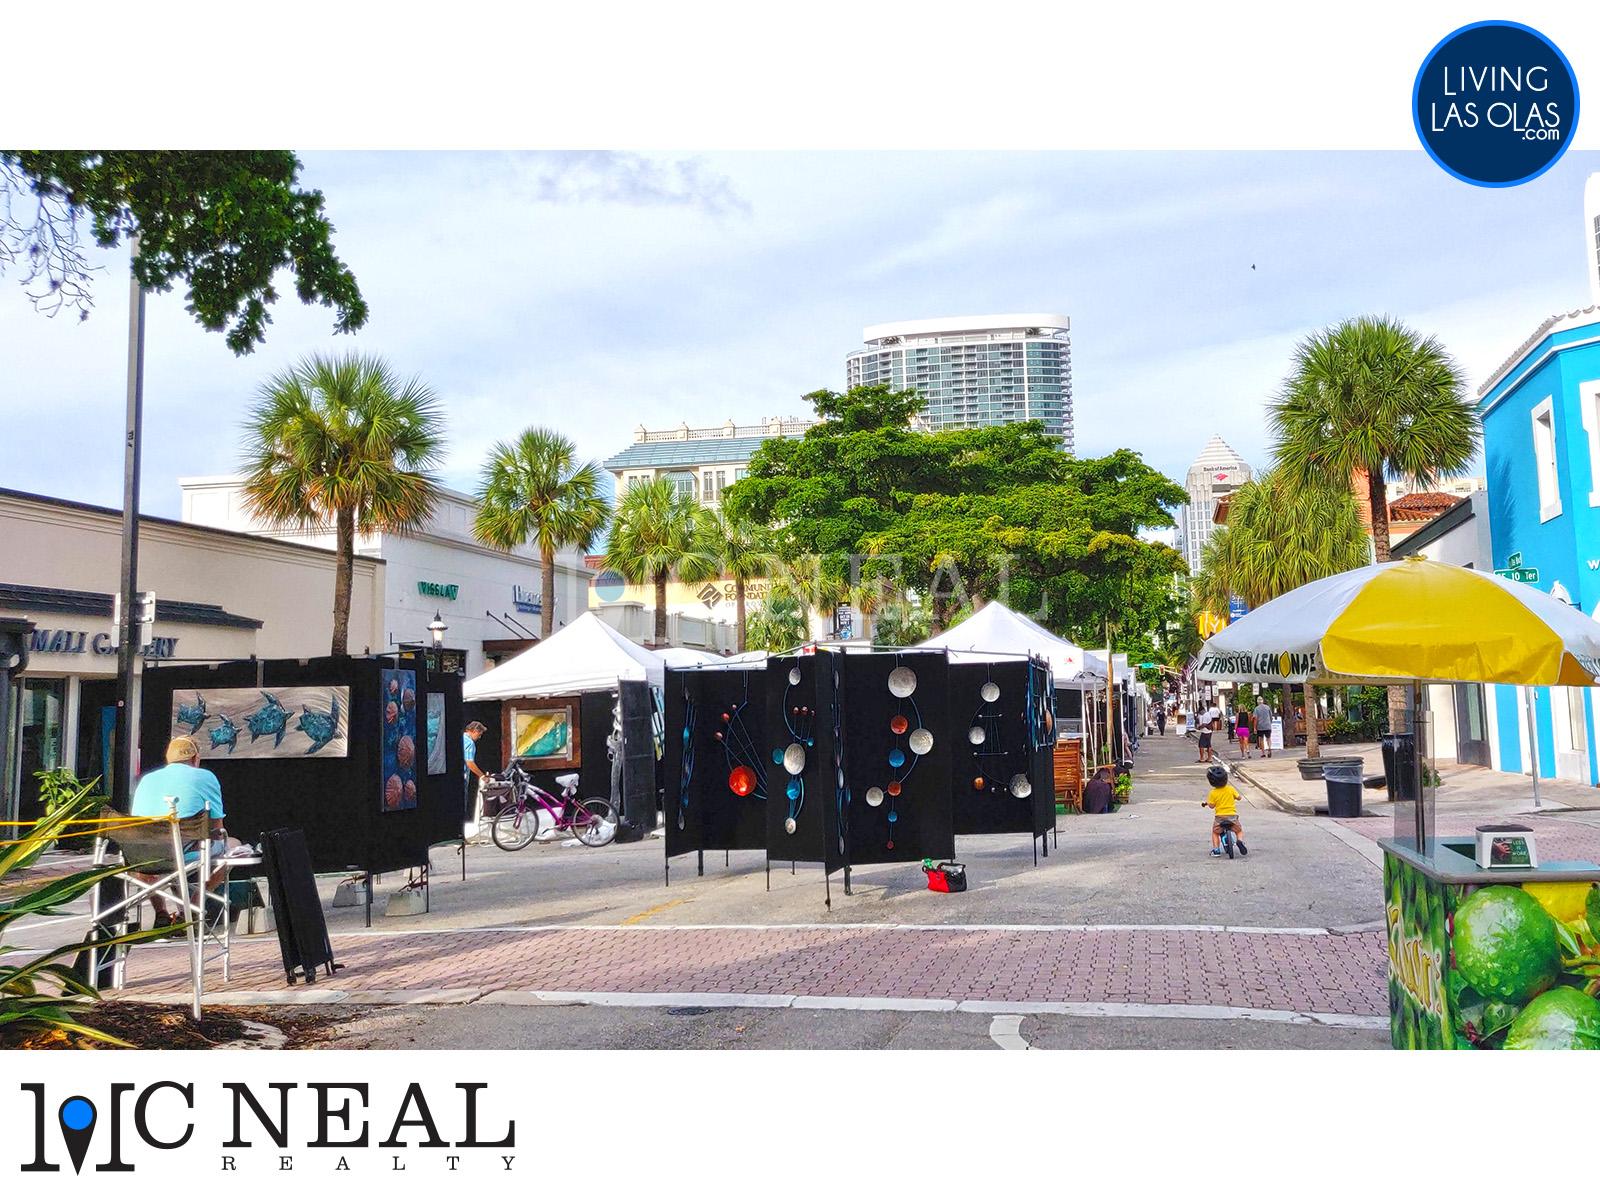 Las Olas Art Fair Resumes Image 01